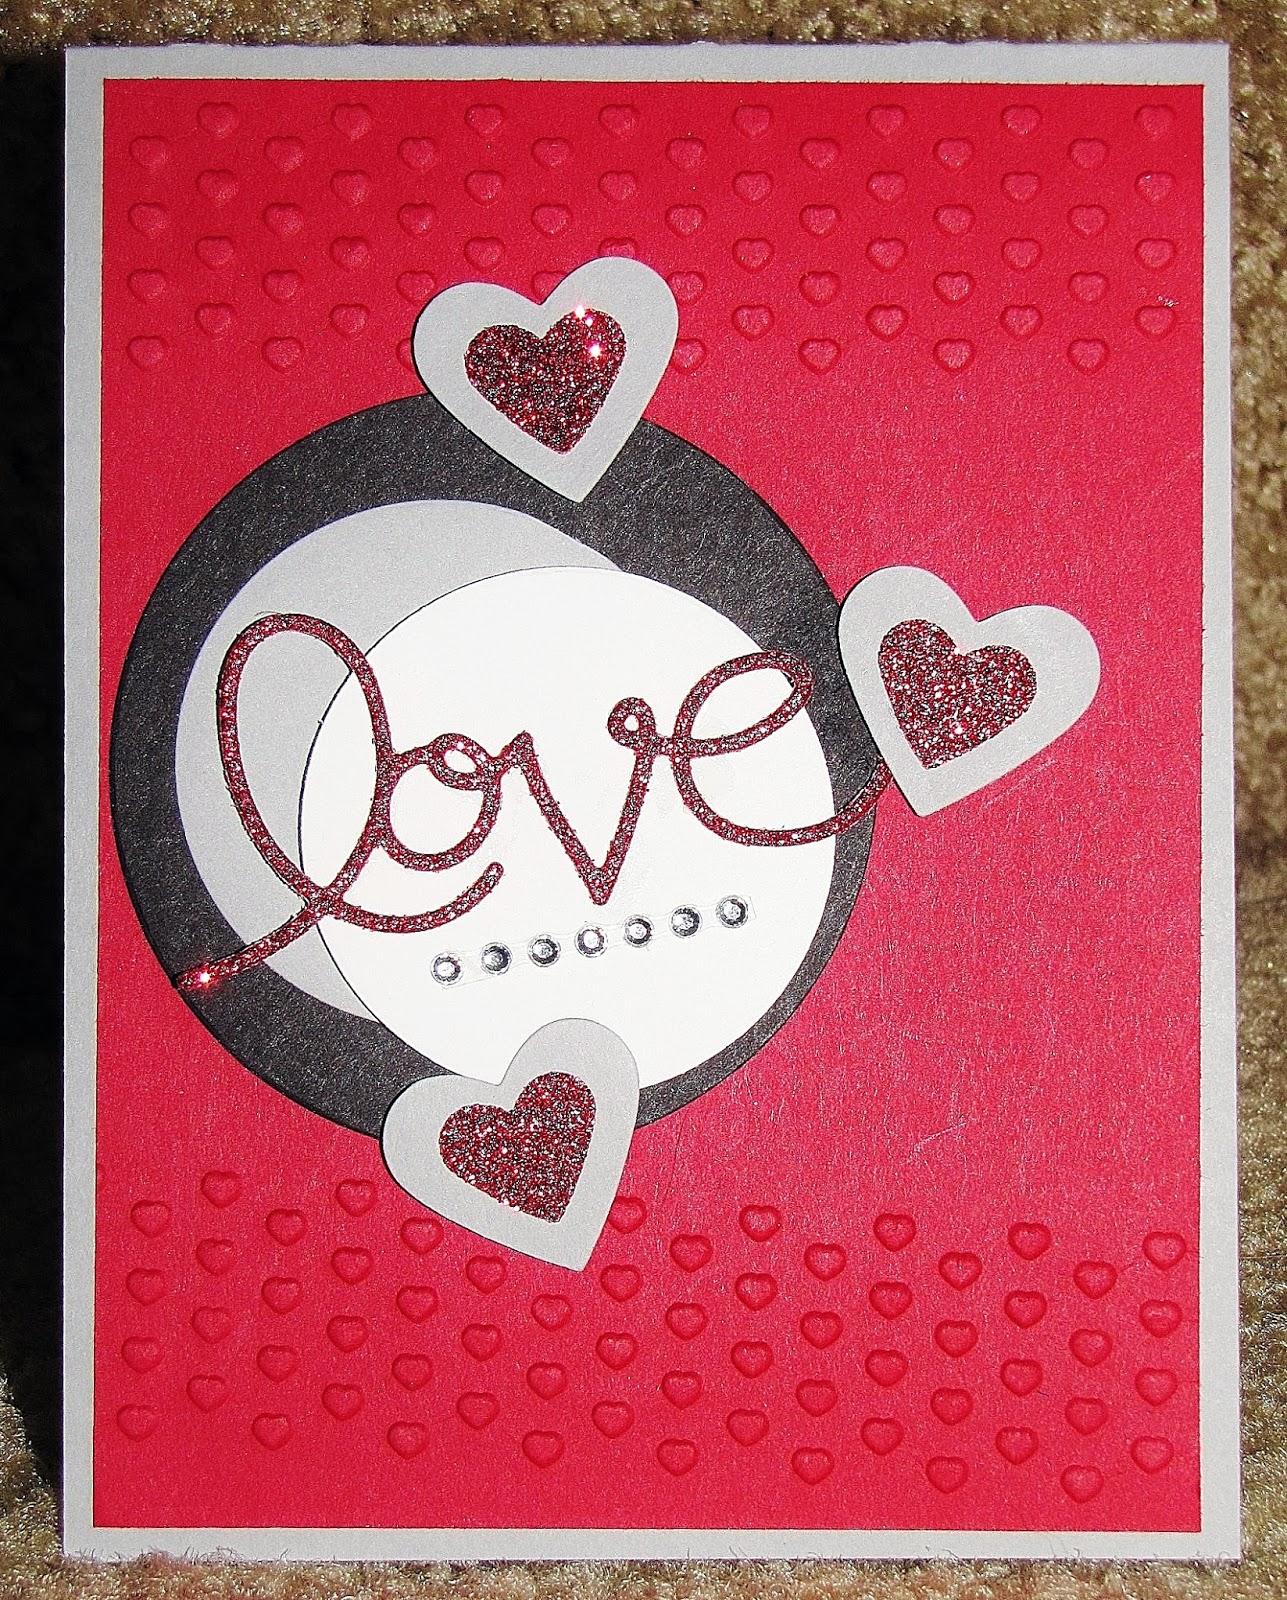 www.heartfeltblessings.blogspot.com